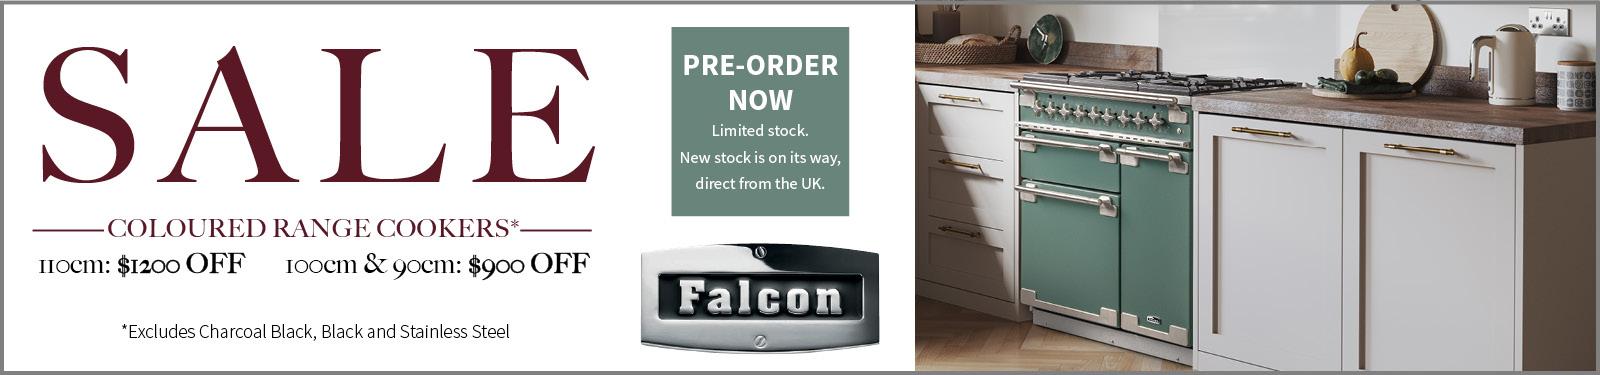 falcon-july2021-promo-colour-your-world-sale-spartan-web-banner-1600x375.jpg